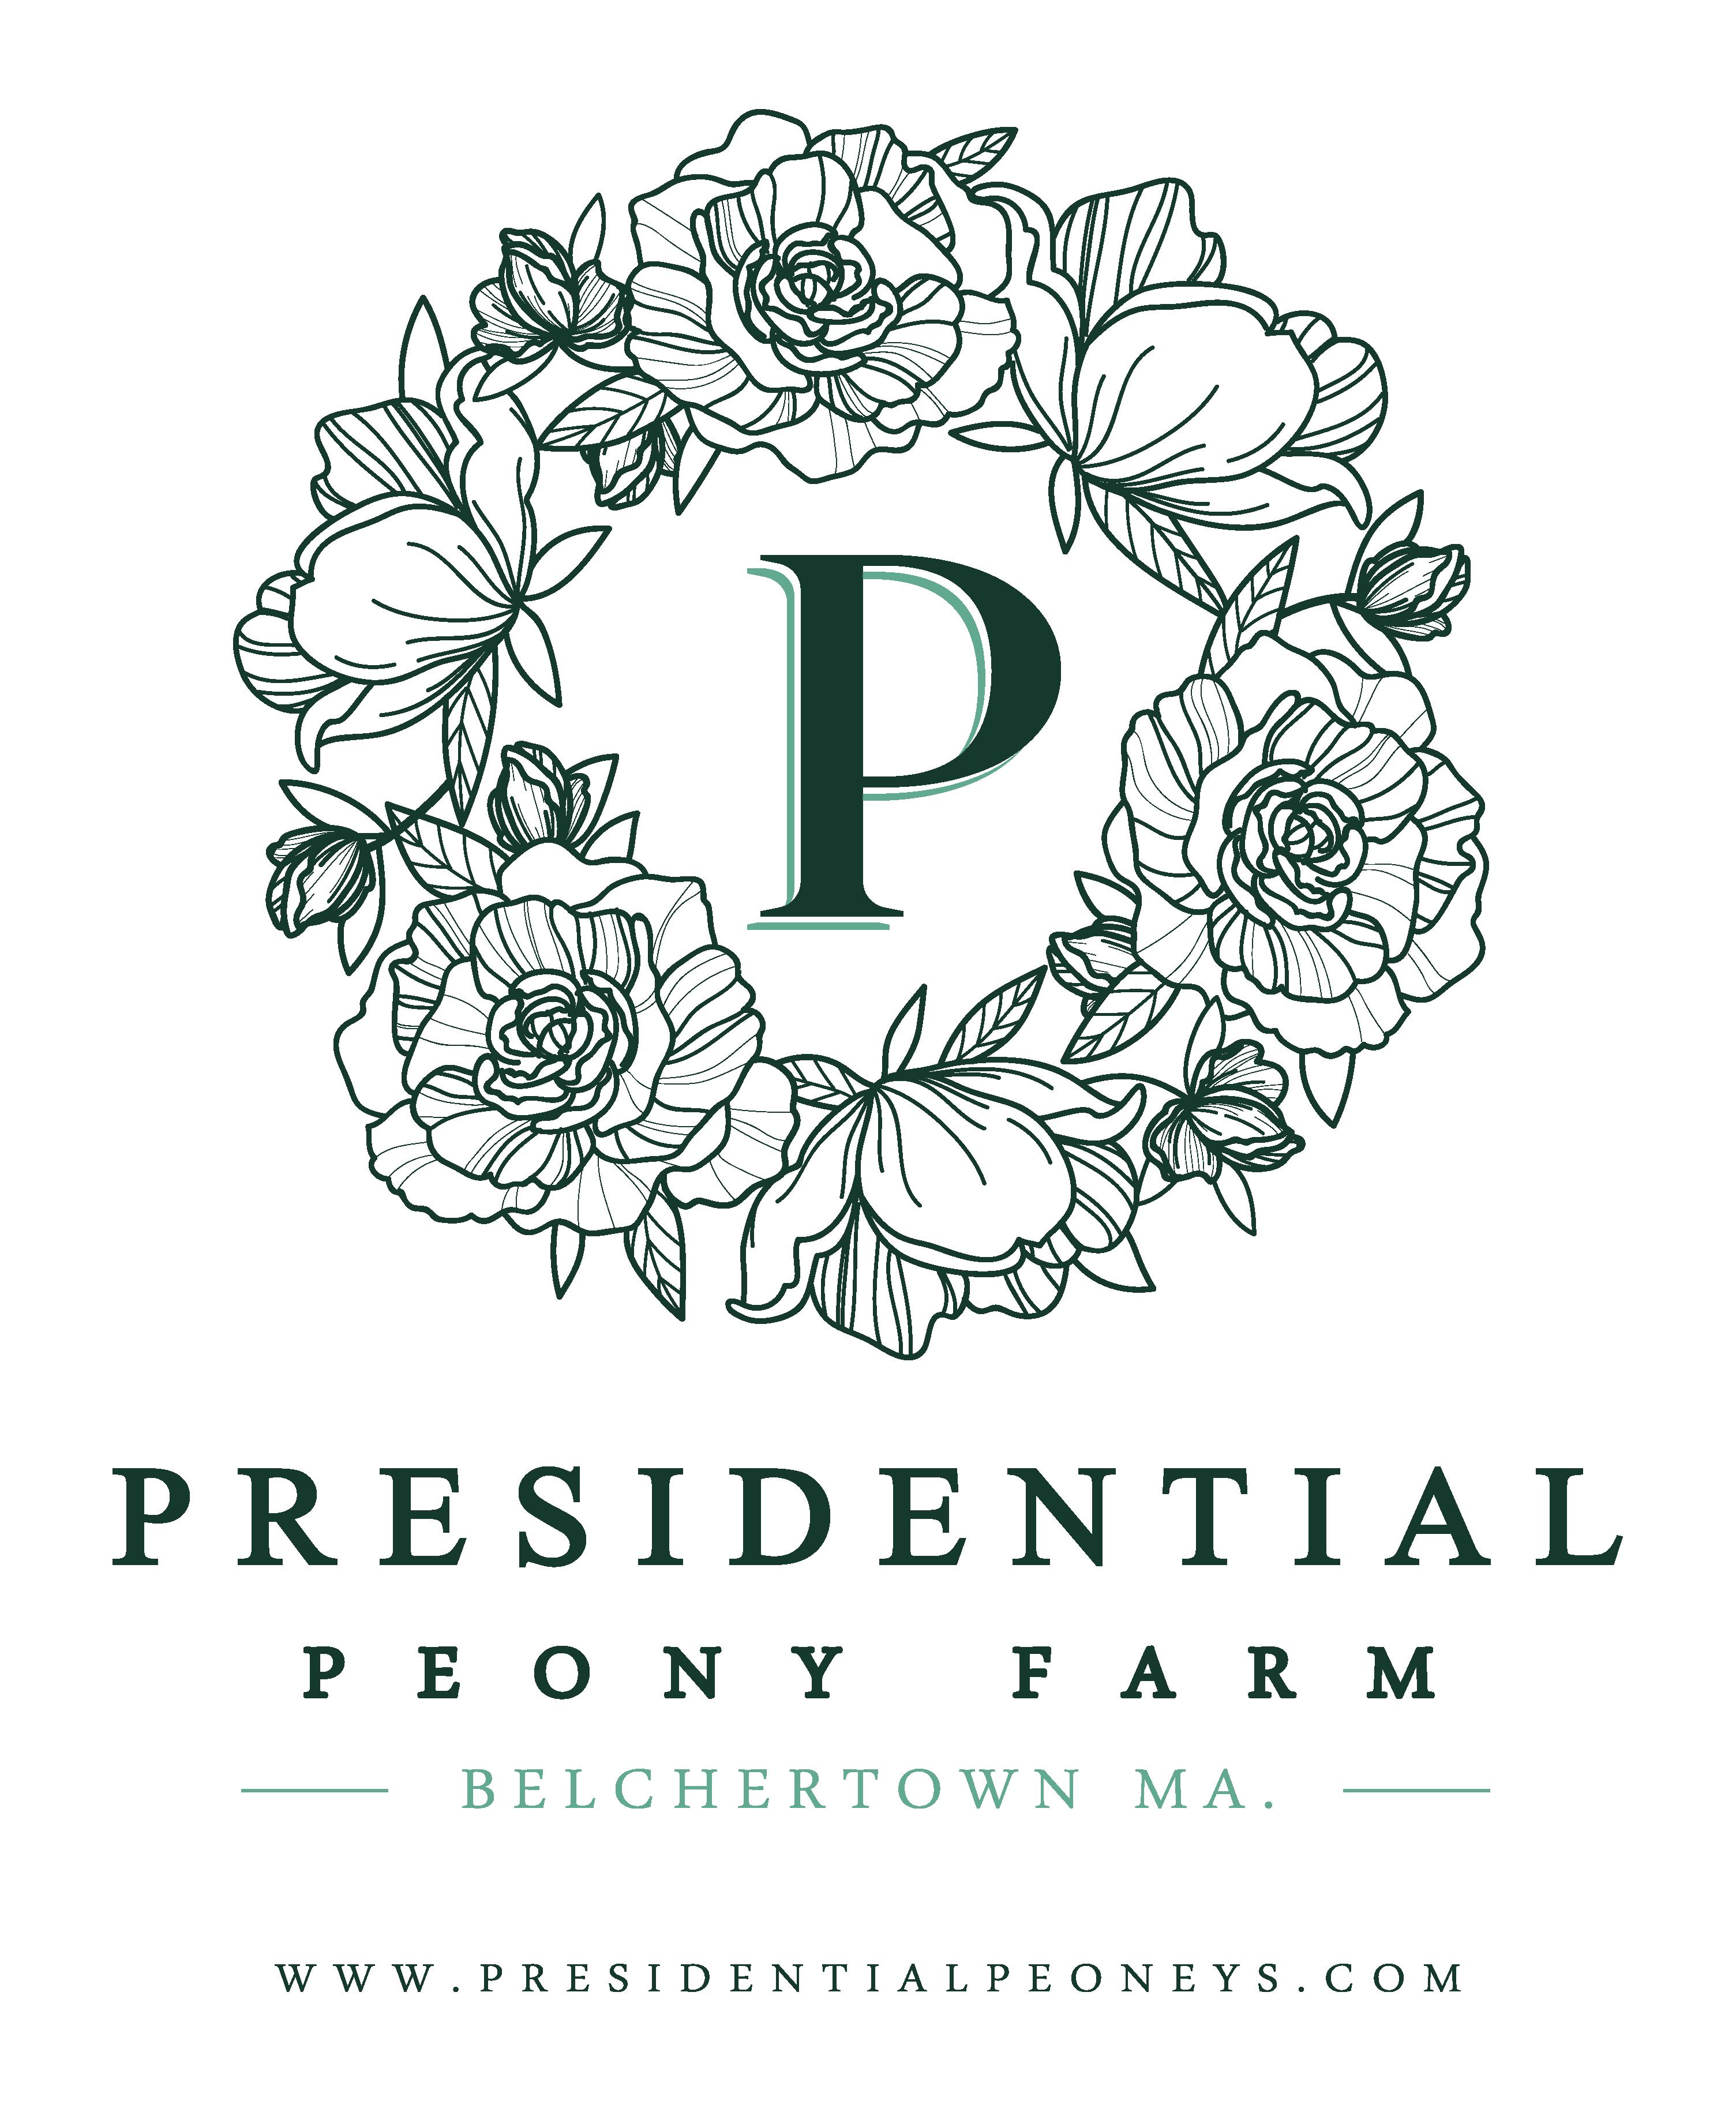 Top quality Peony, flower Farm needs a classy Logo